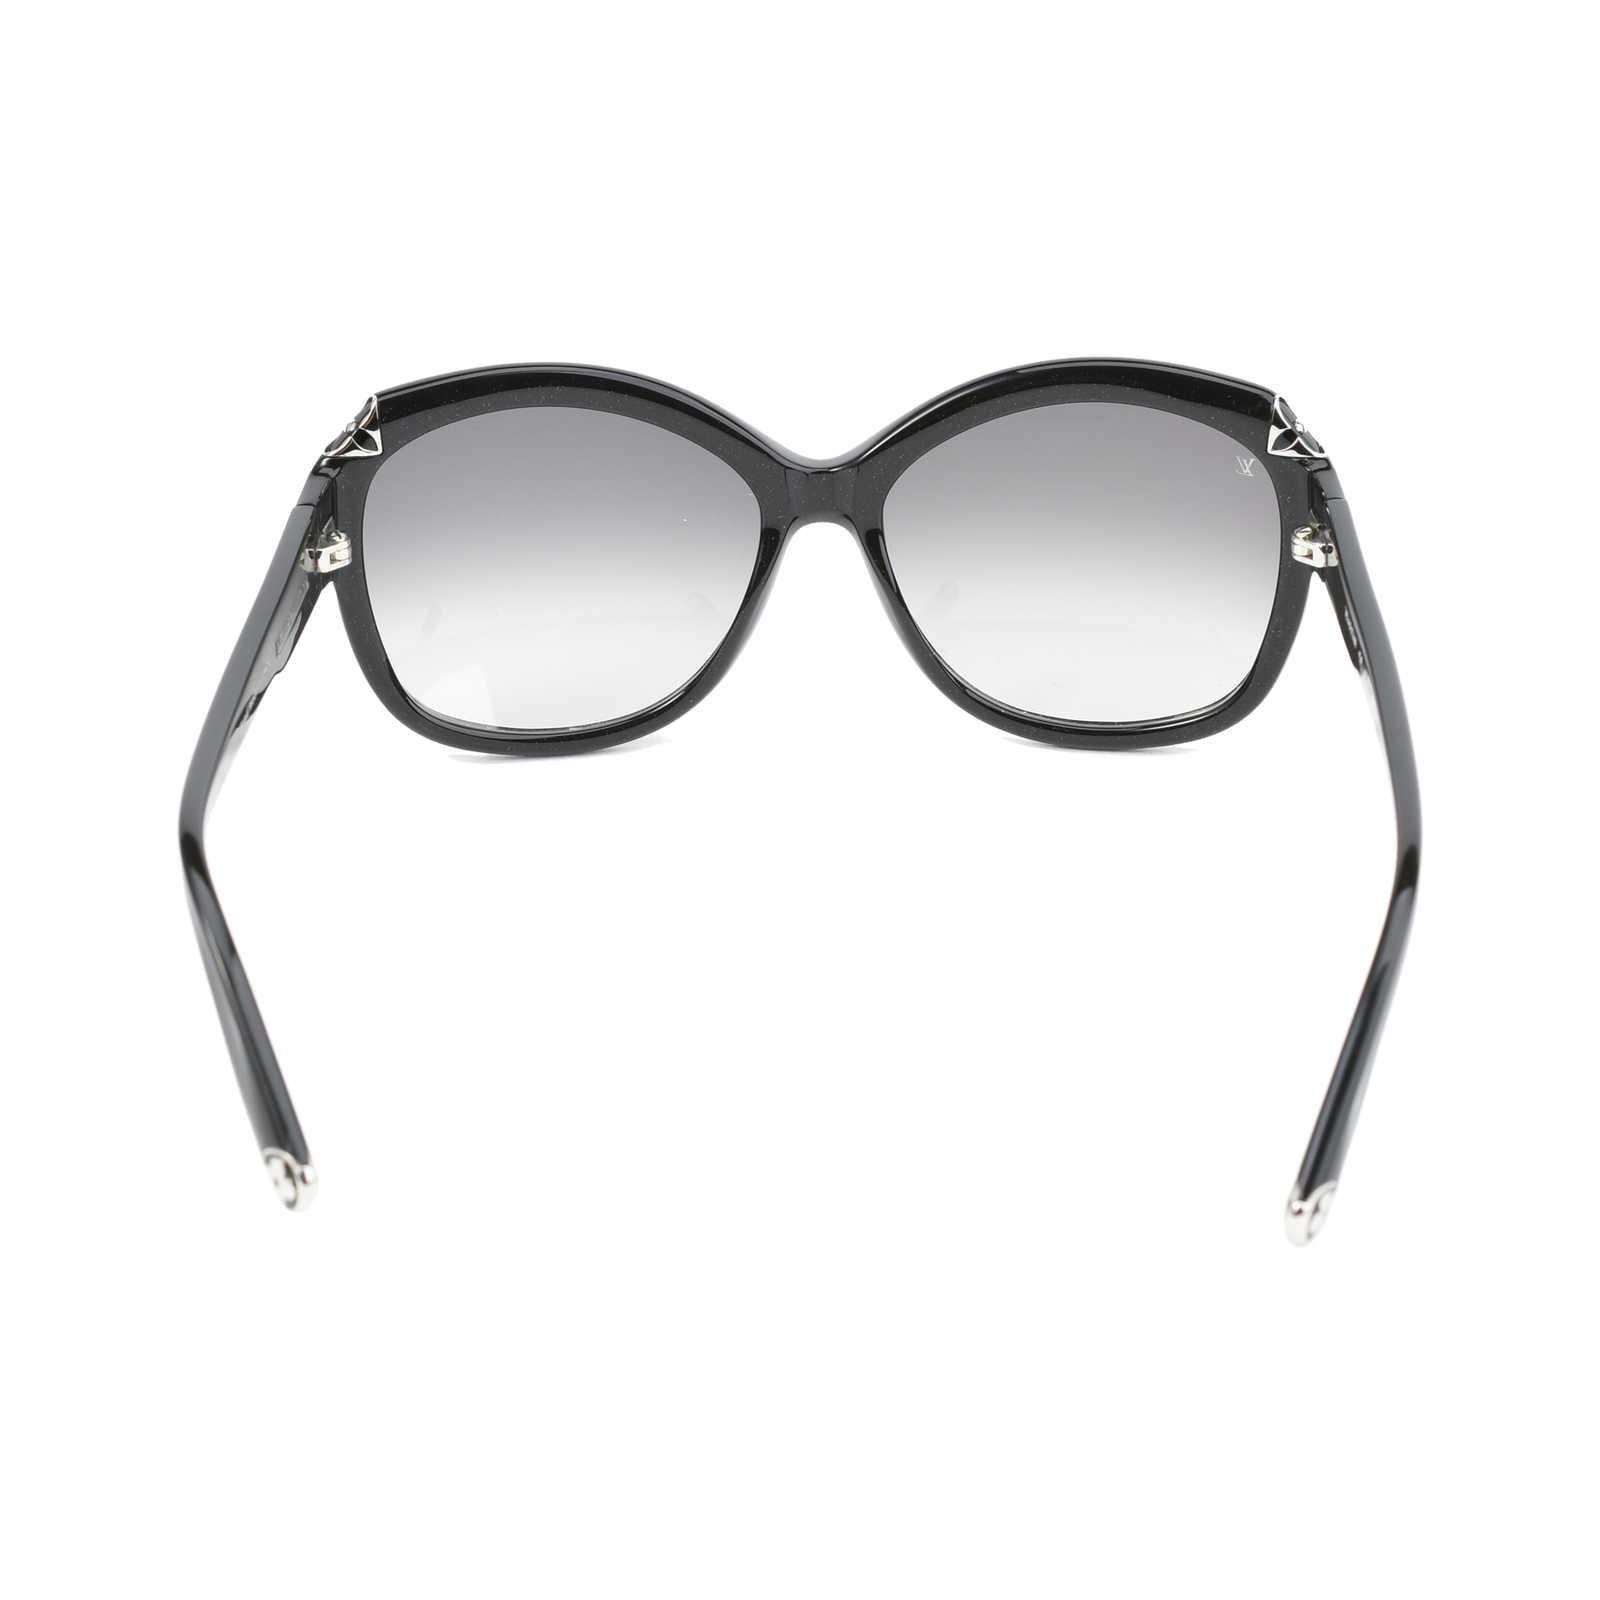 8515e9392fda7 ... Authentic Second Hand Louis Vuitton Hortensia Sunglasses  (PSS-413-00008) - Thumbnail ...